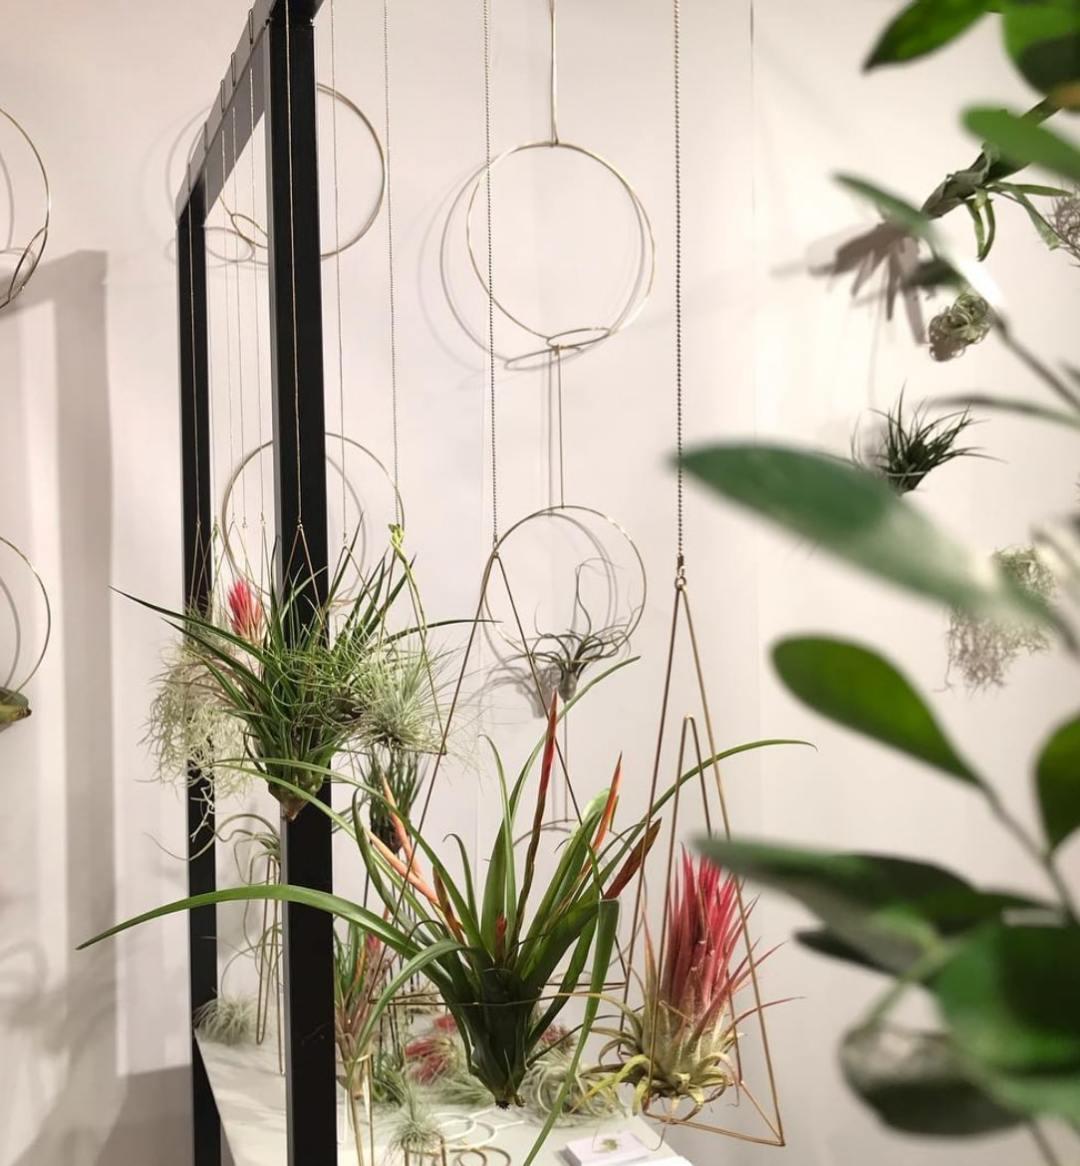 Airplant hangers by Studio Hali-Ann Tooms